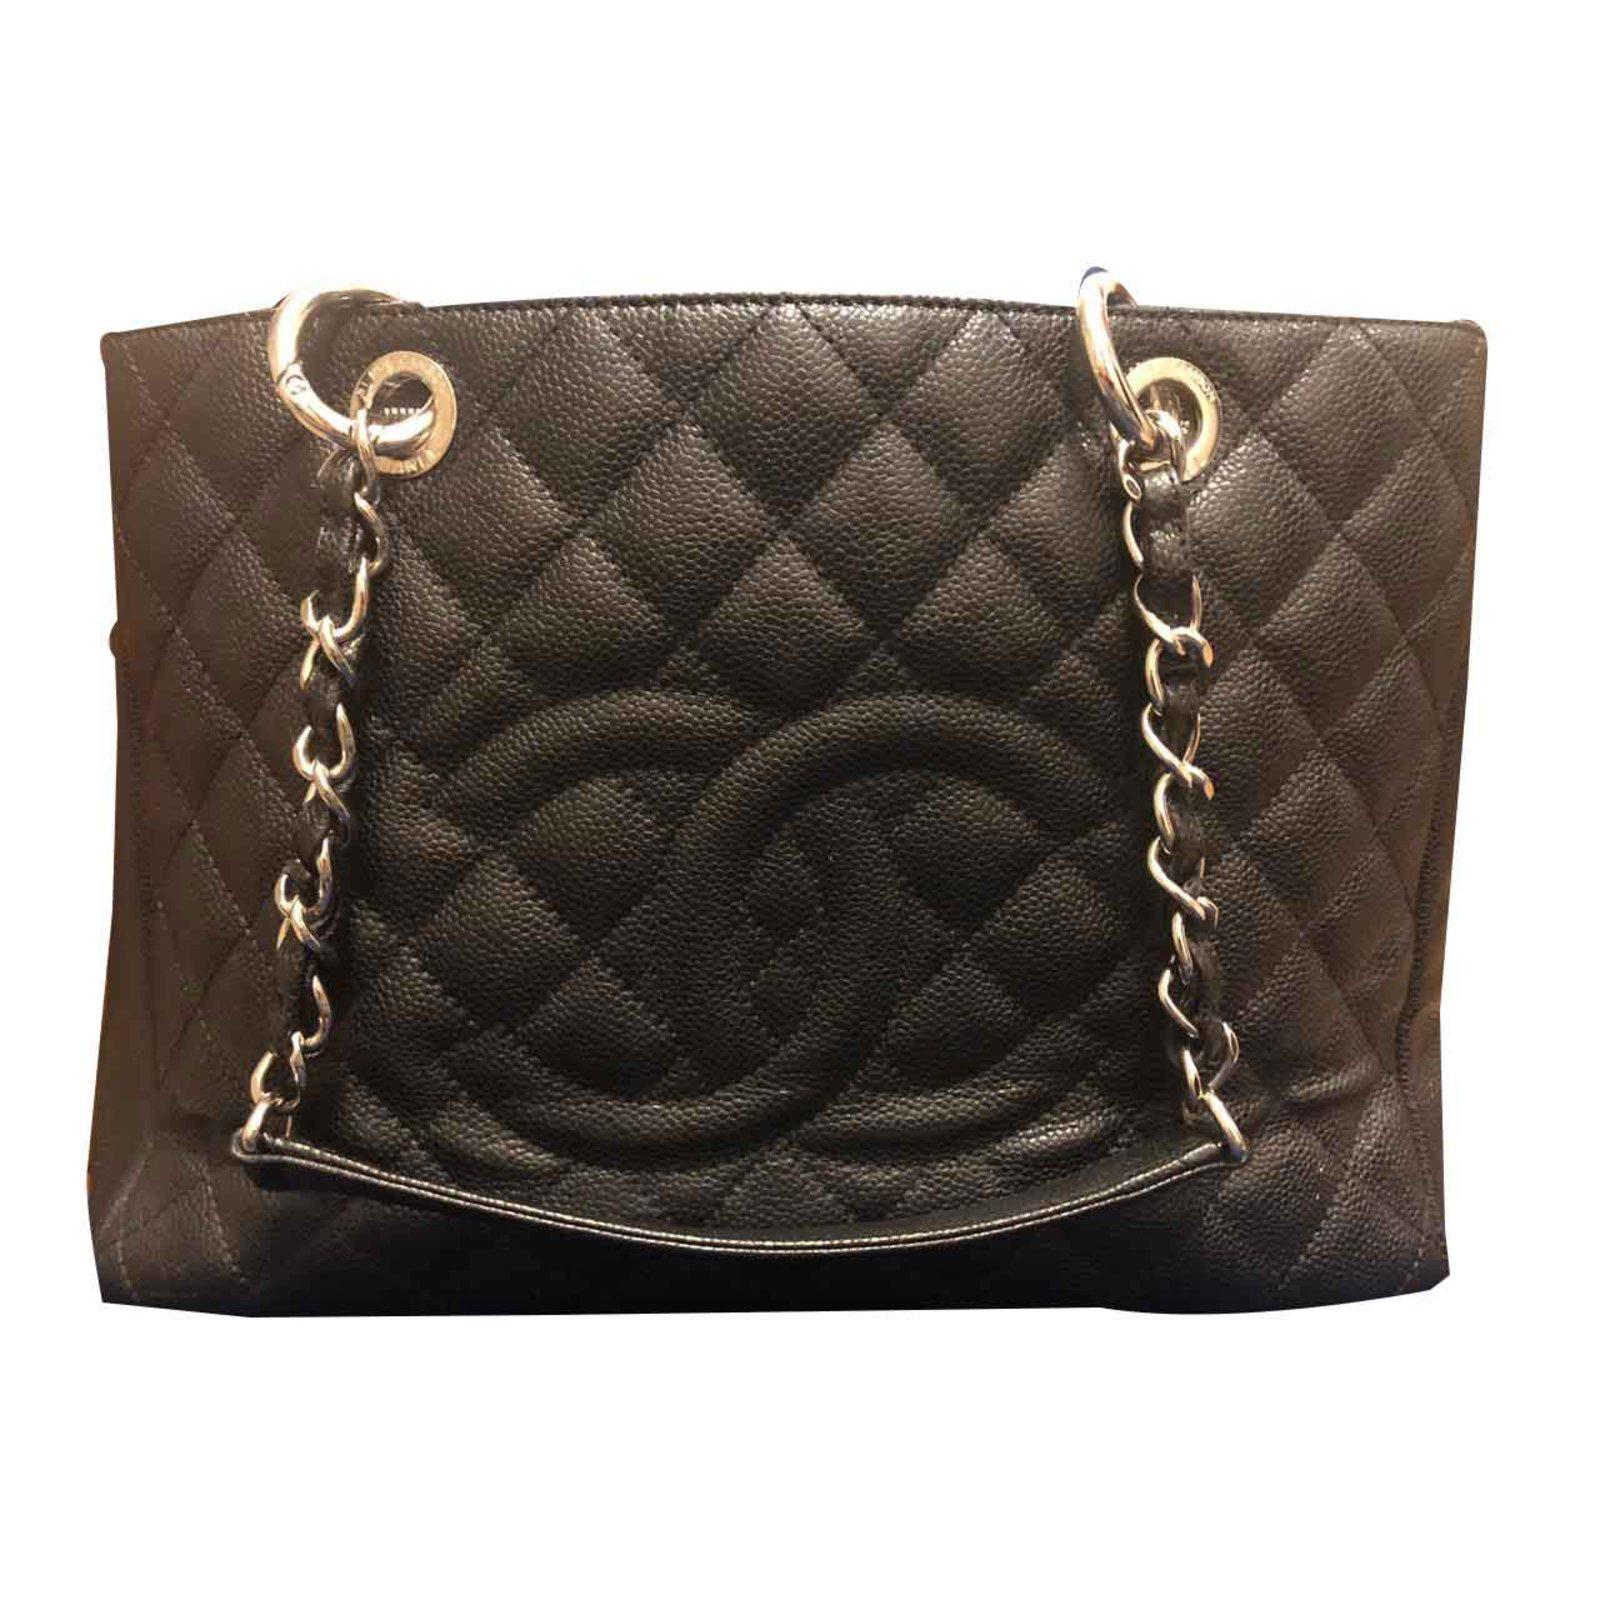 2a93ccd2f488 Chanel Grand shopping Handbags Leather Hazelnut ref.101654 - Joli Closet